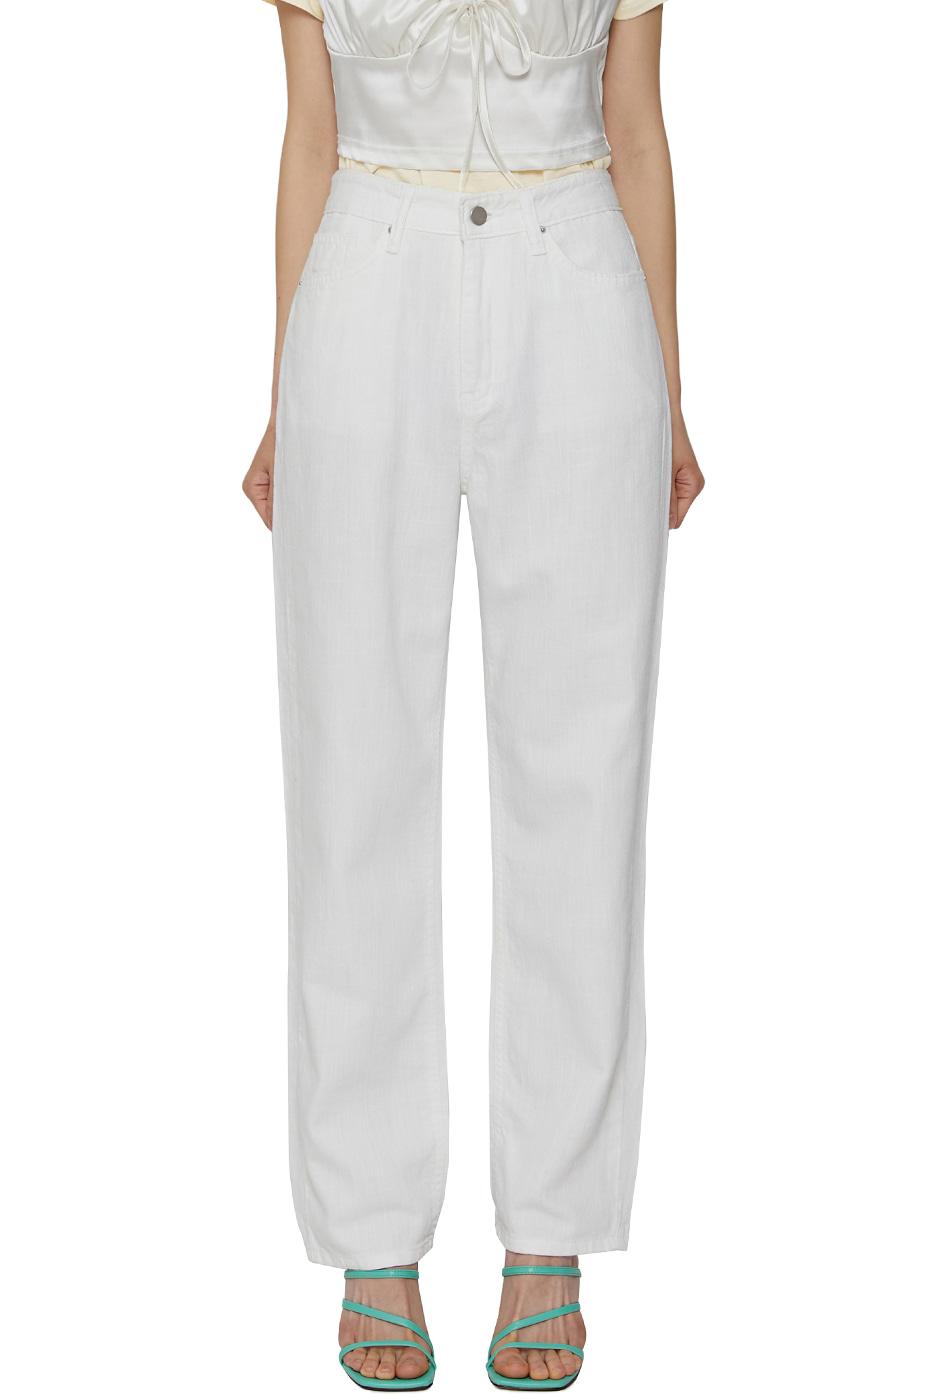 White linen straight jeans